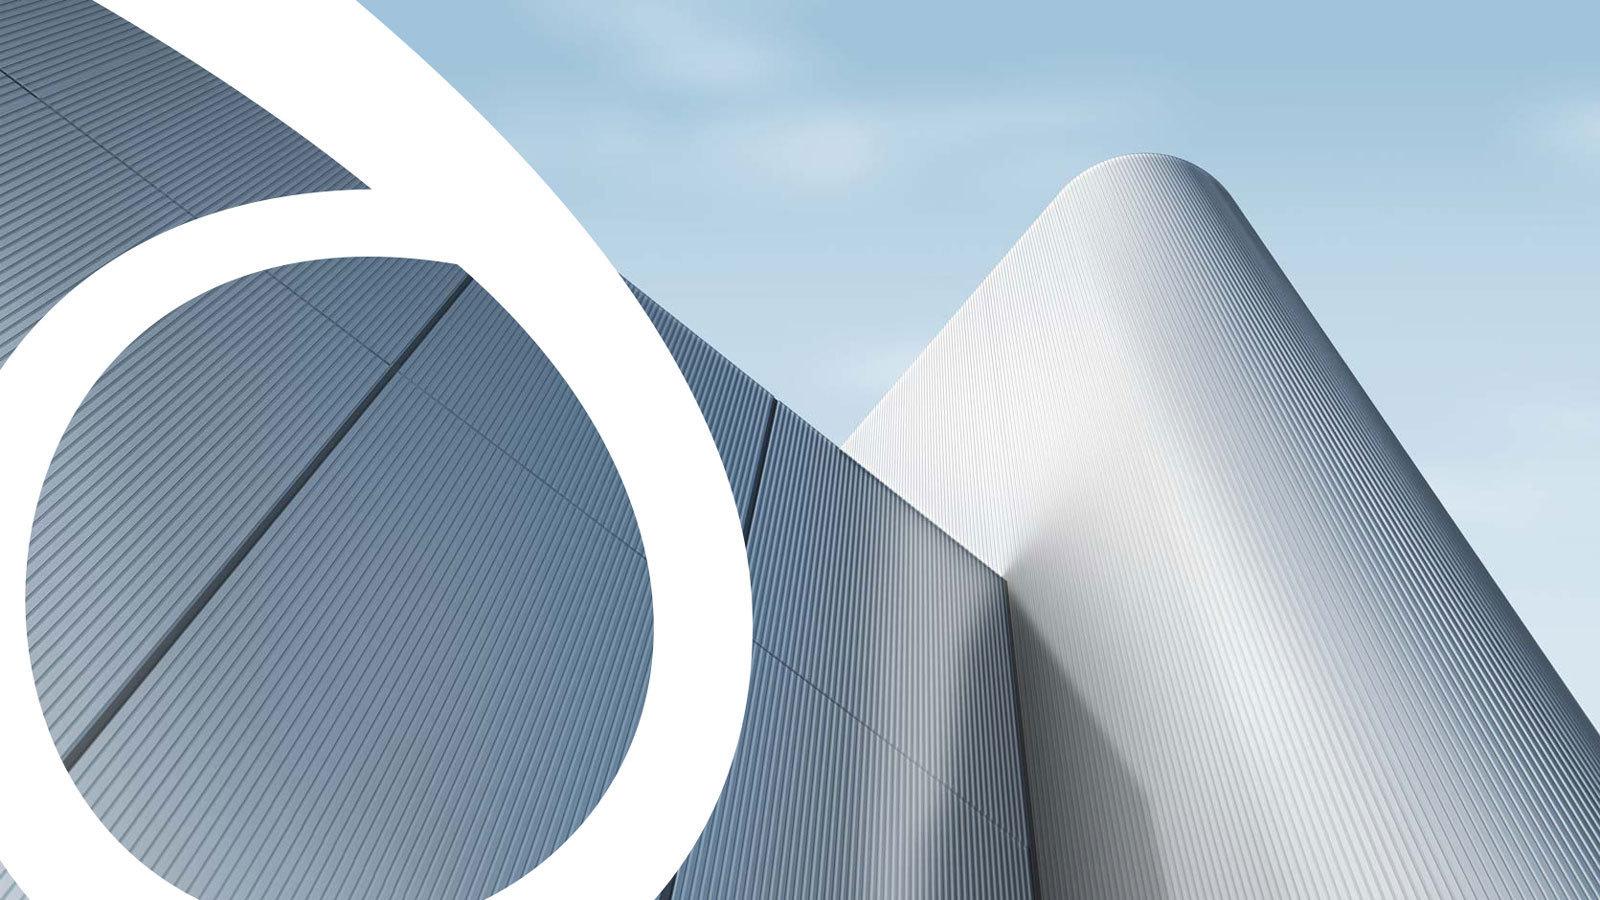 Dwuzet Fassadentechnik Fassadensanierung, Wärmedämmverbundsysteme, Klinkerfassadensanierung, Verblendmauerwerksanierung